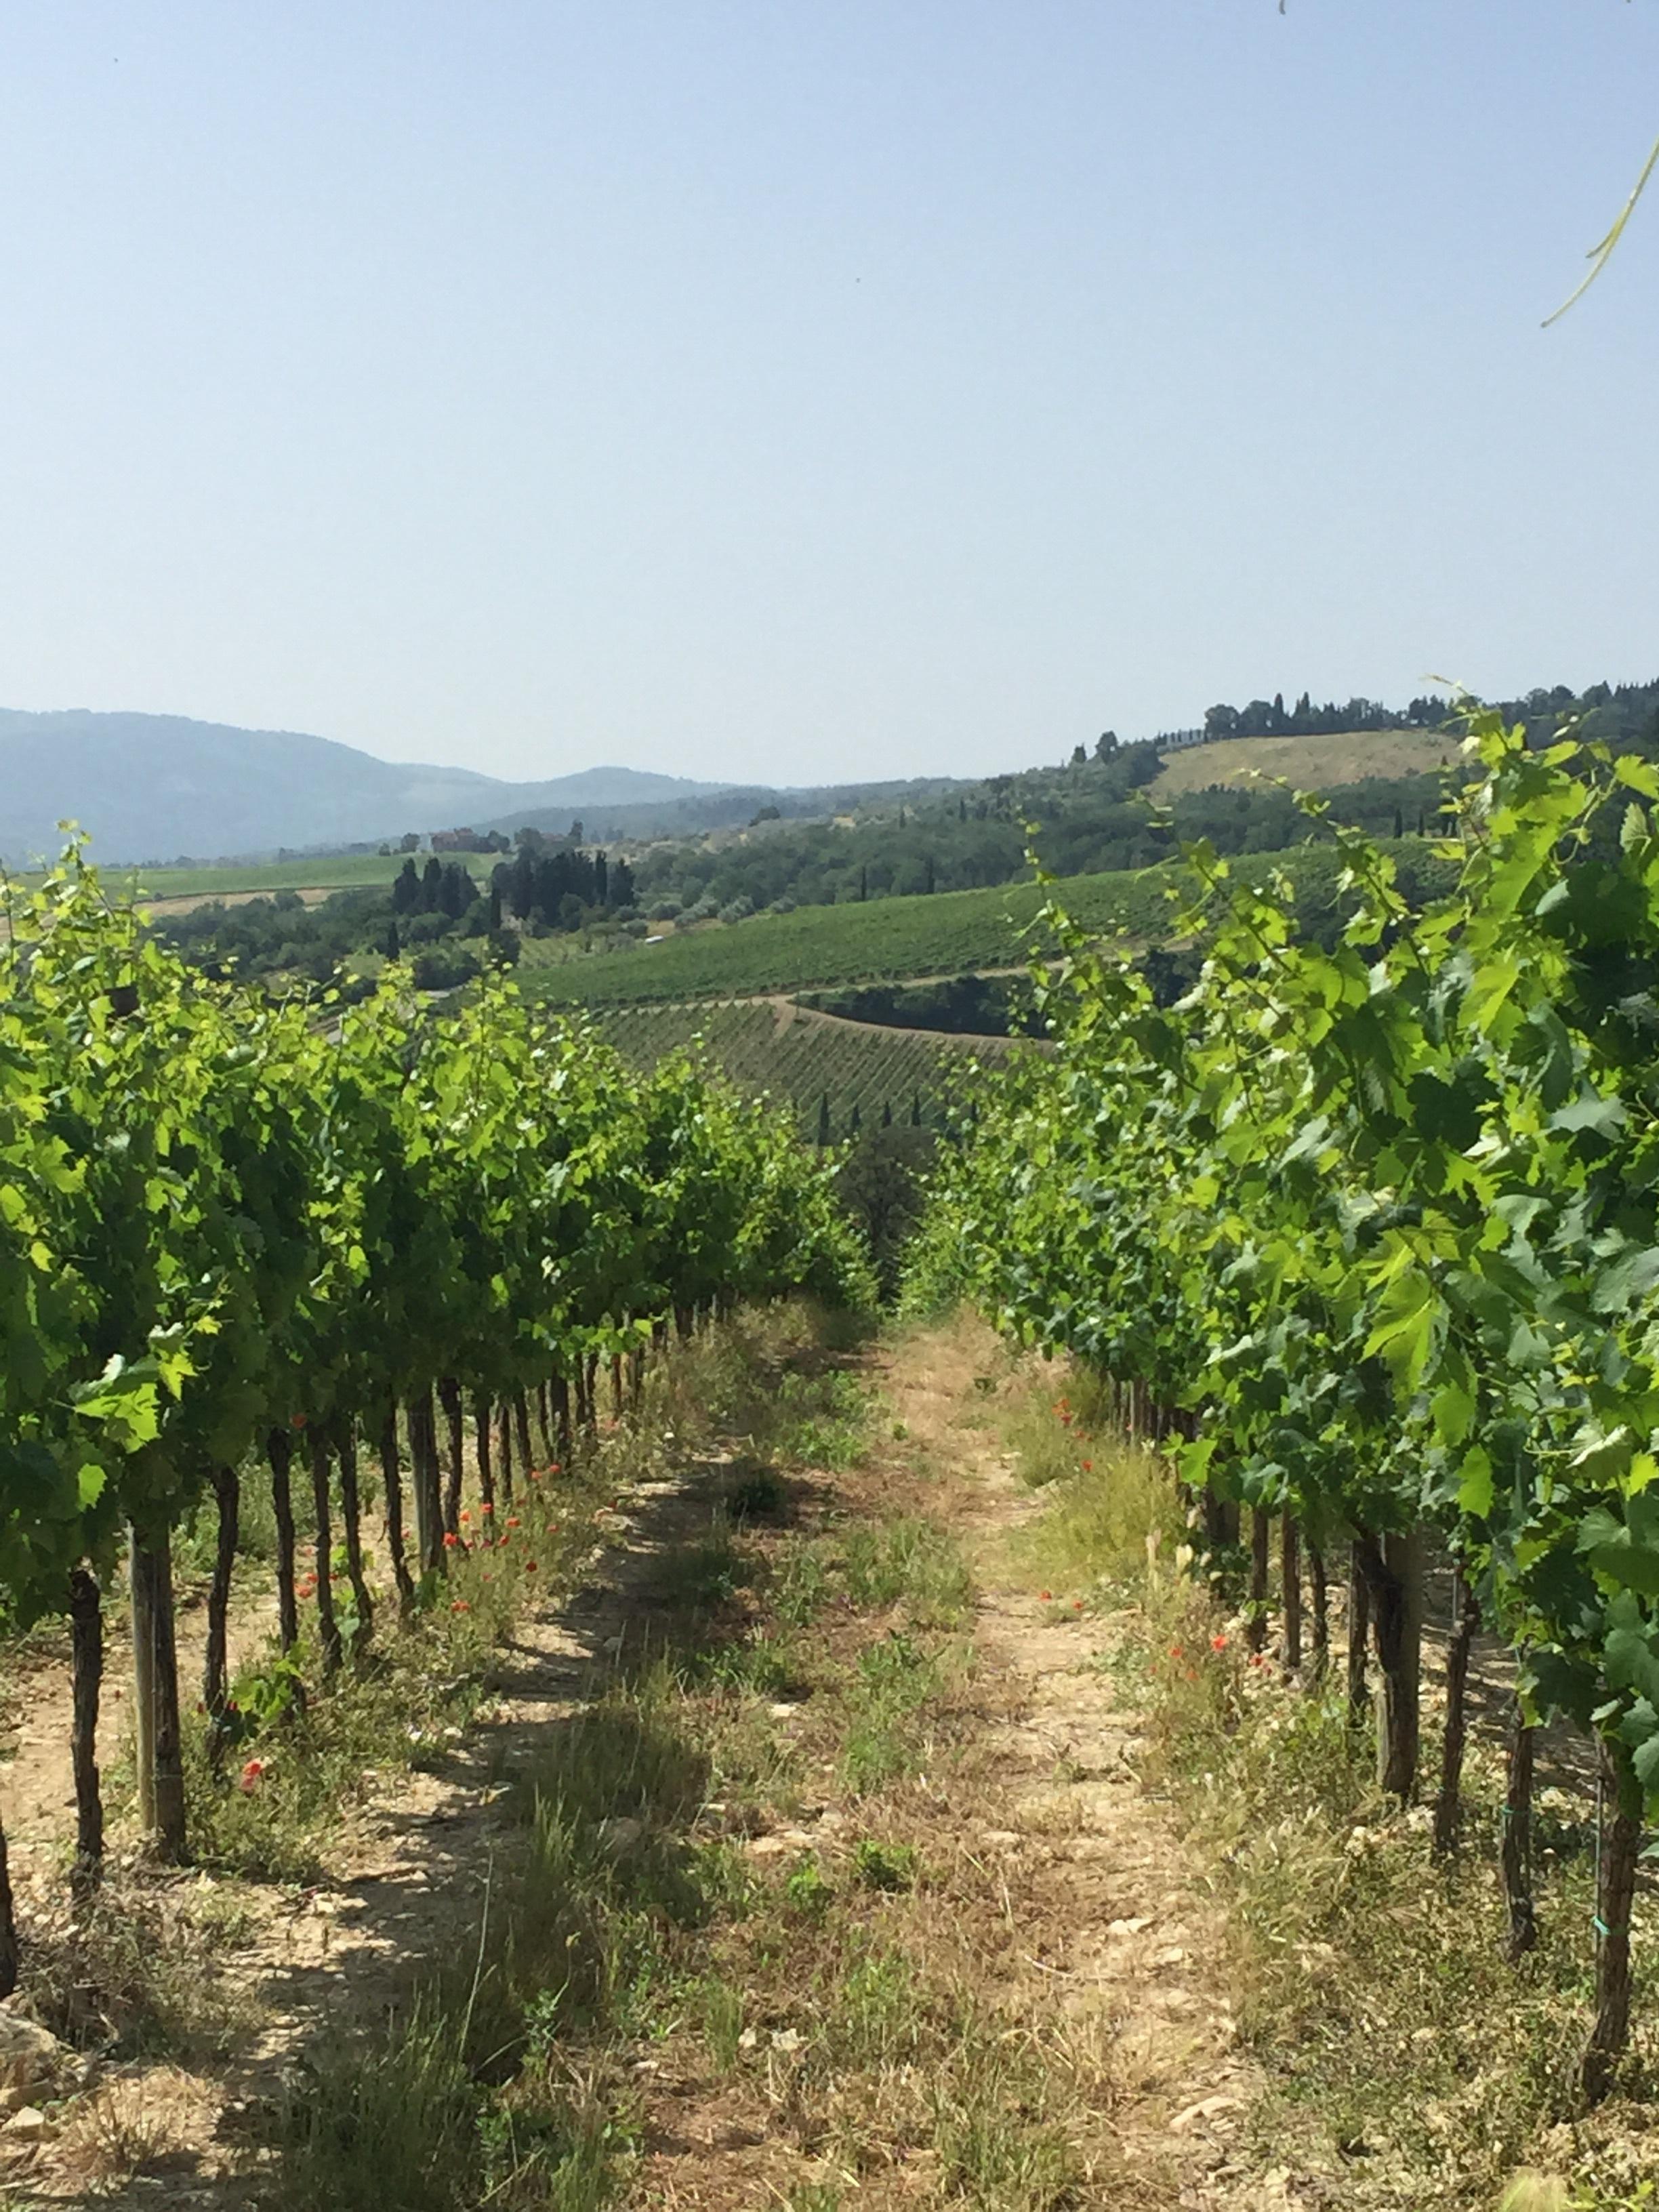 A Chianti region vineyard